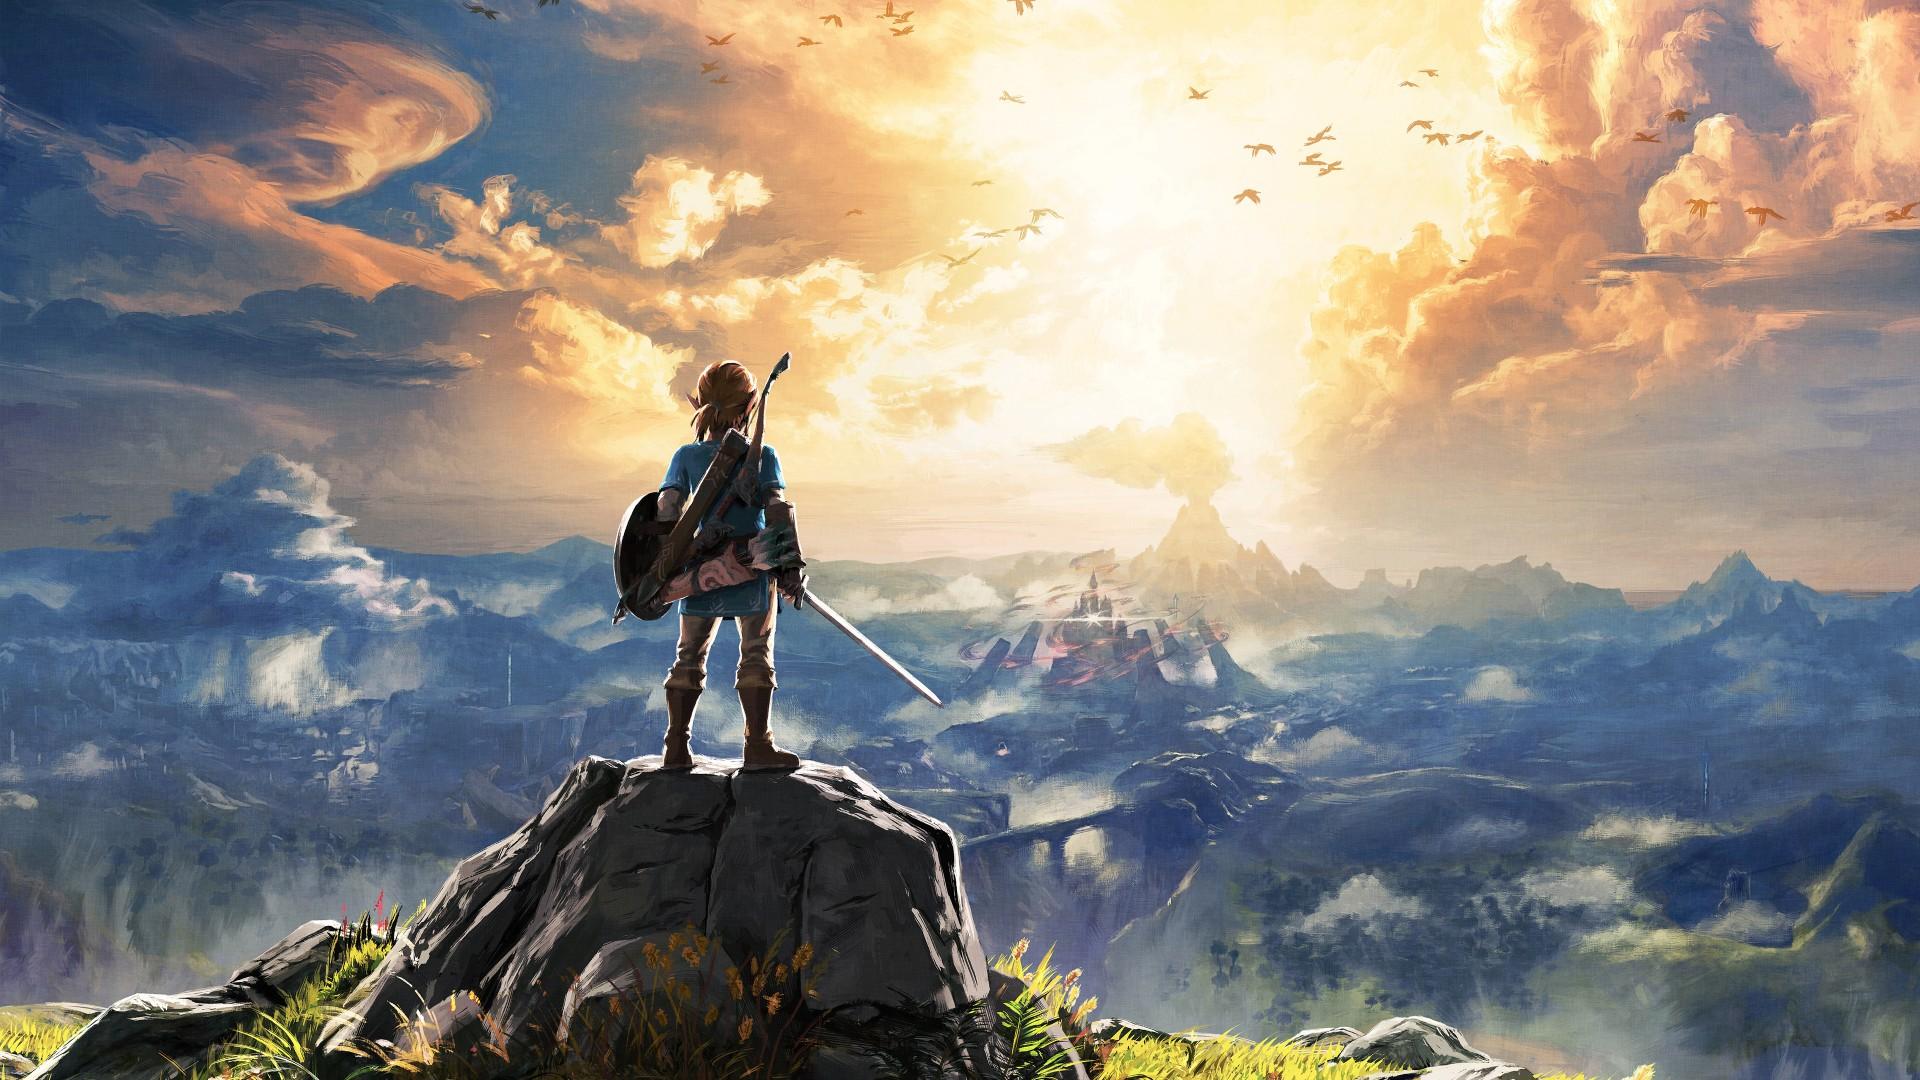 Cute Pokemon Iphone Wallpapers The Legend Of Zelda Breath Of The Wild 4k Wallpapers Hd